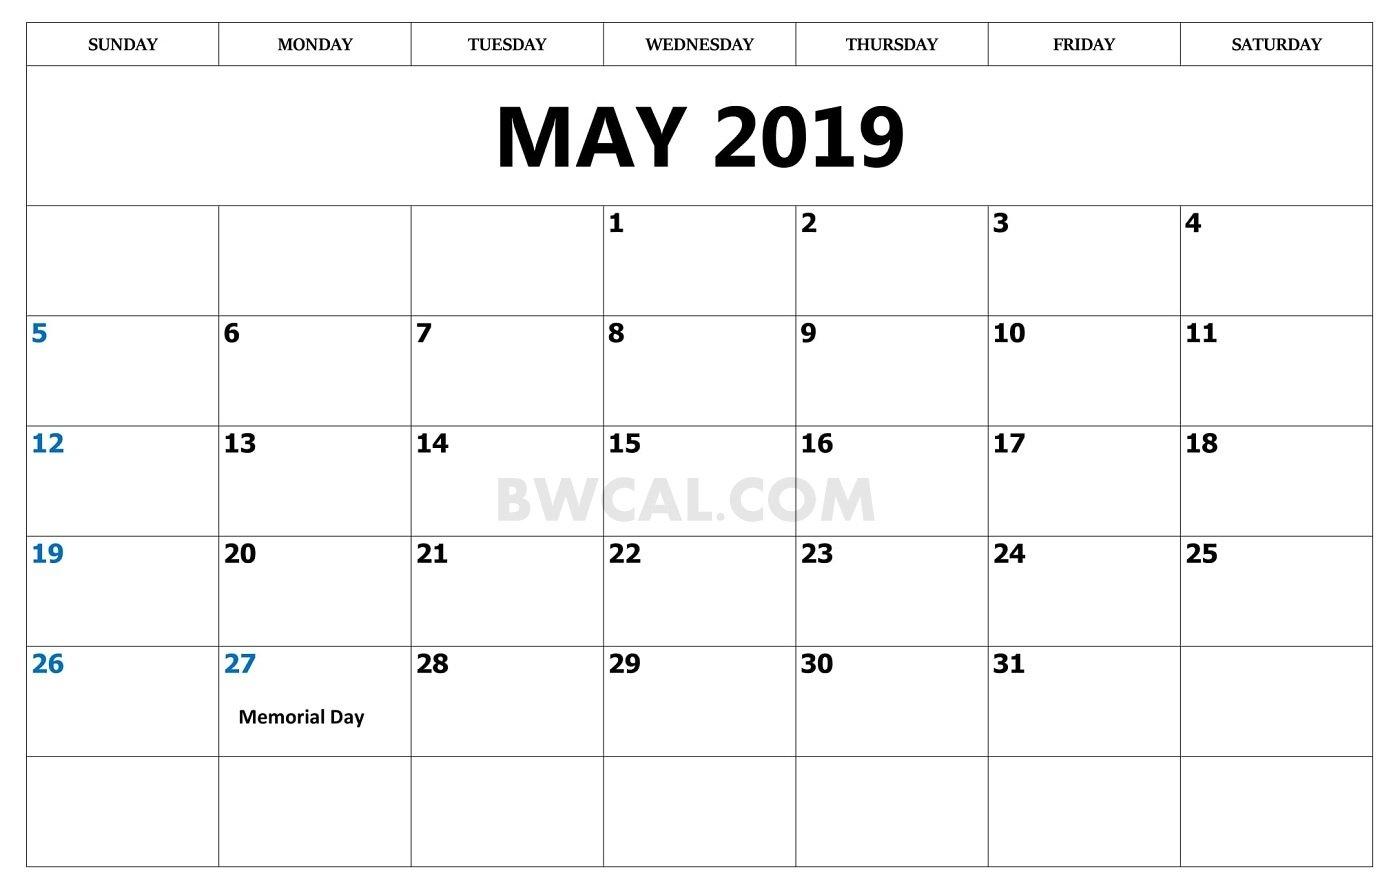 May 2019 Calendar Usa Archives – Blank And White Calendar Calendar 2019 Memorial Day